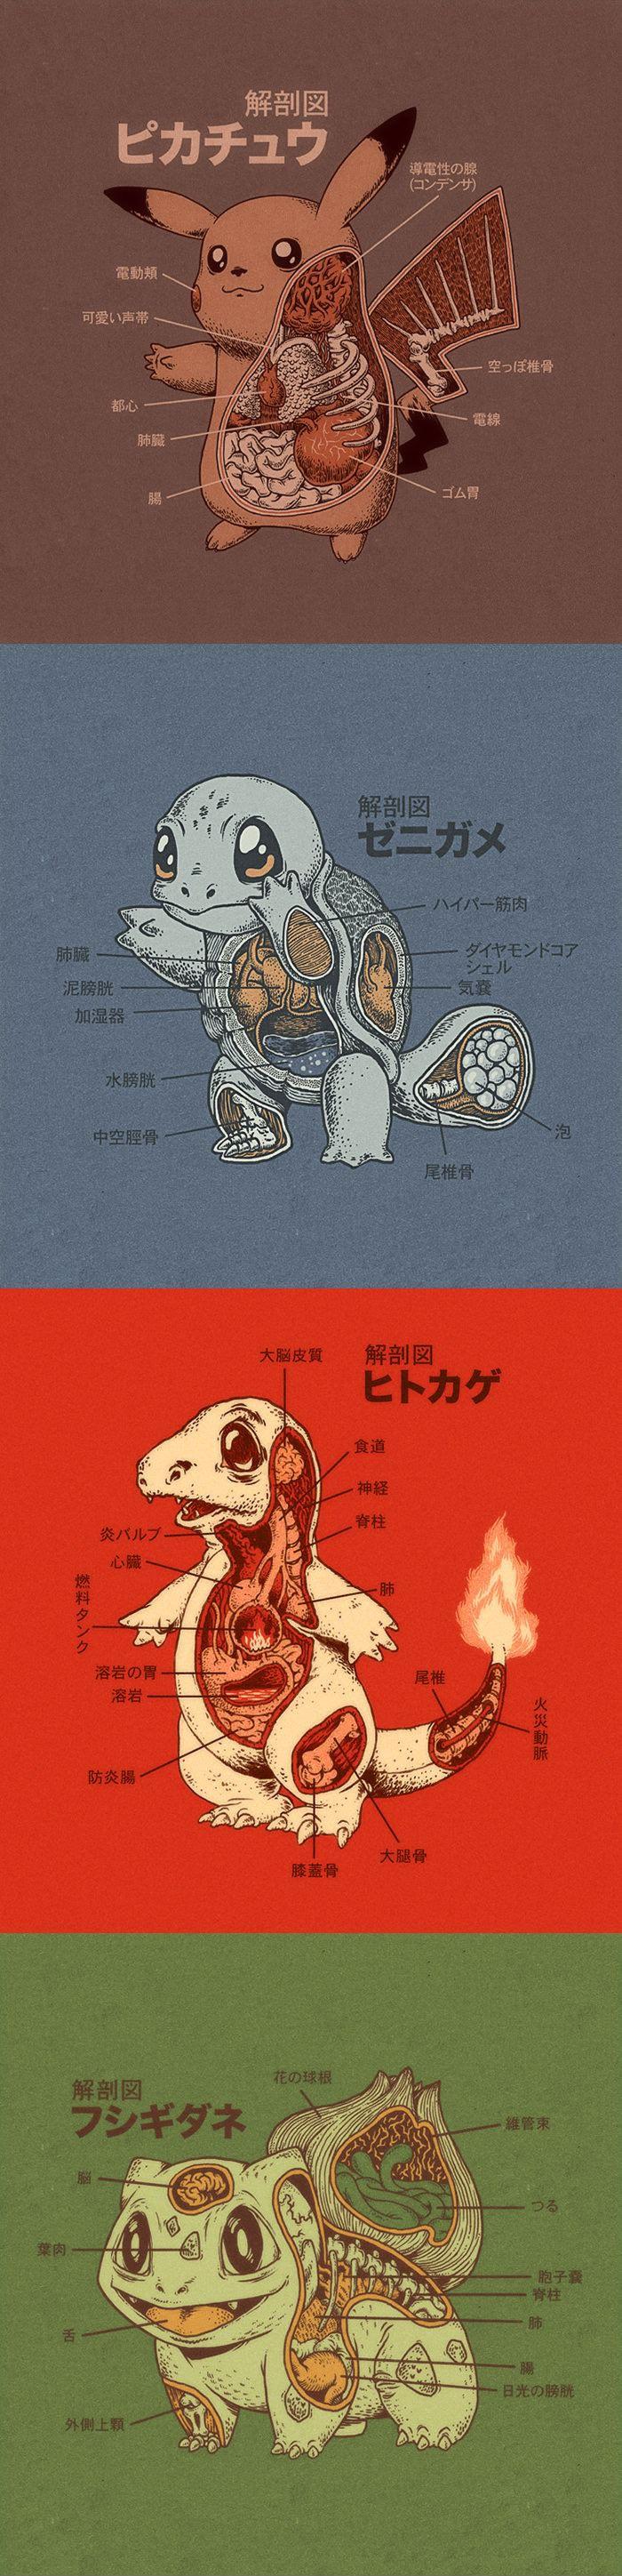 Pokemon Anatomy (English translation)